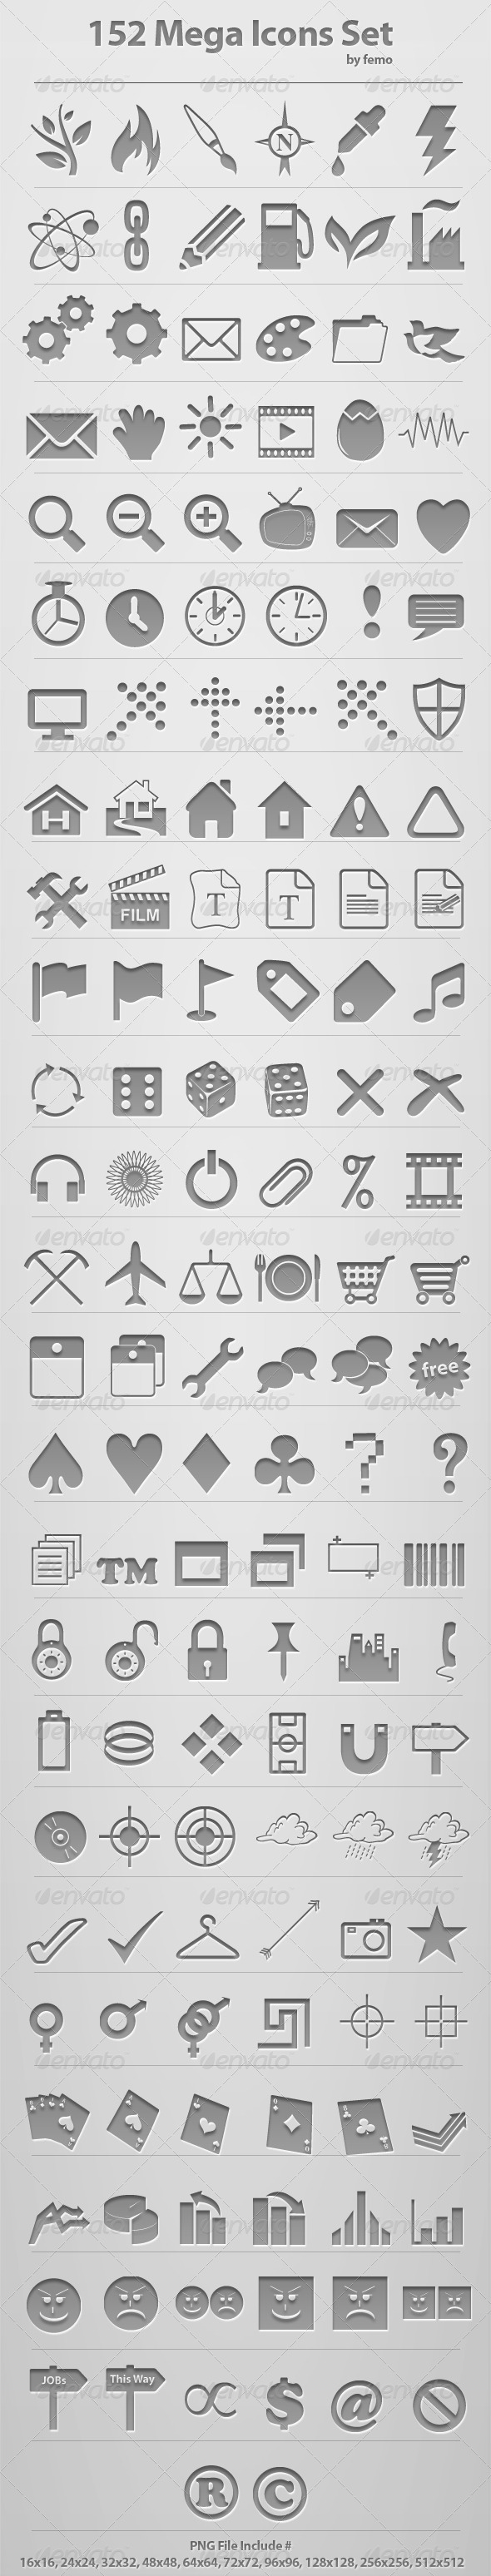 GraphicRiver 152 Mega Icons Set 109746